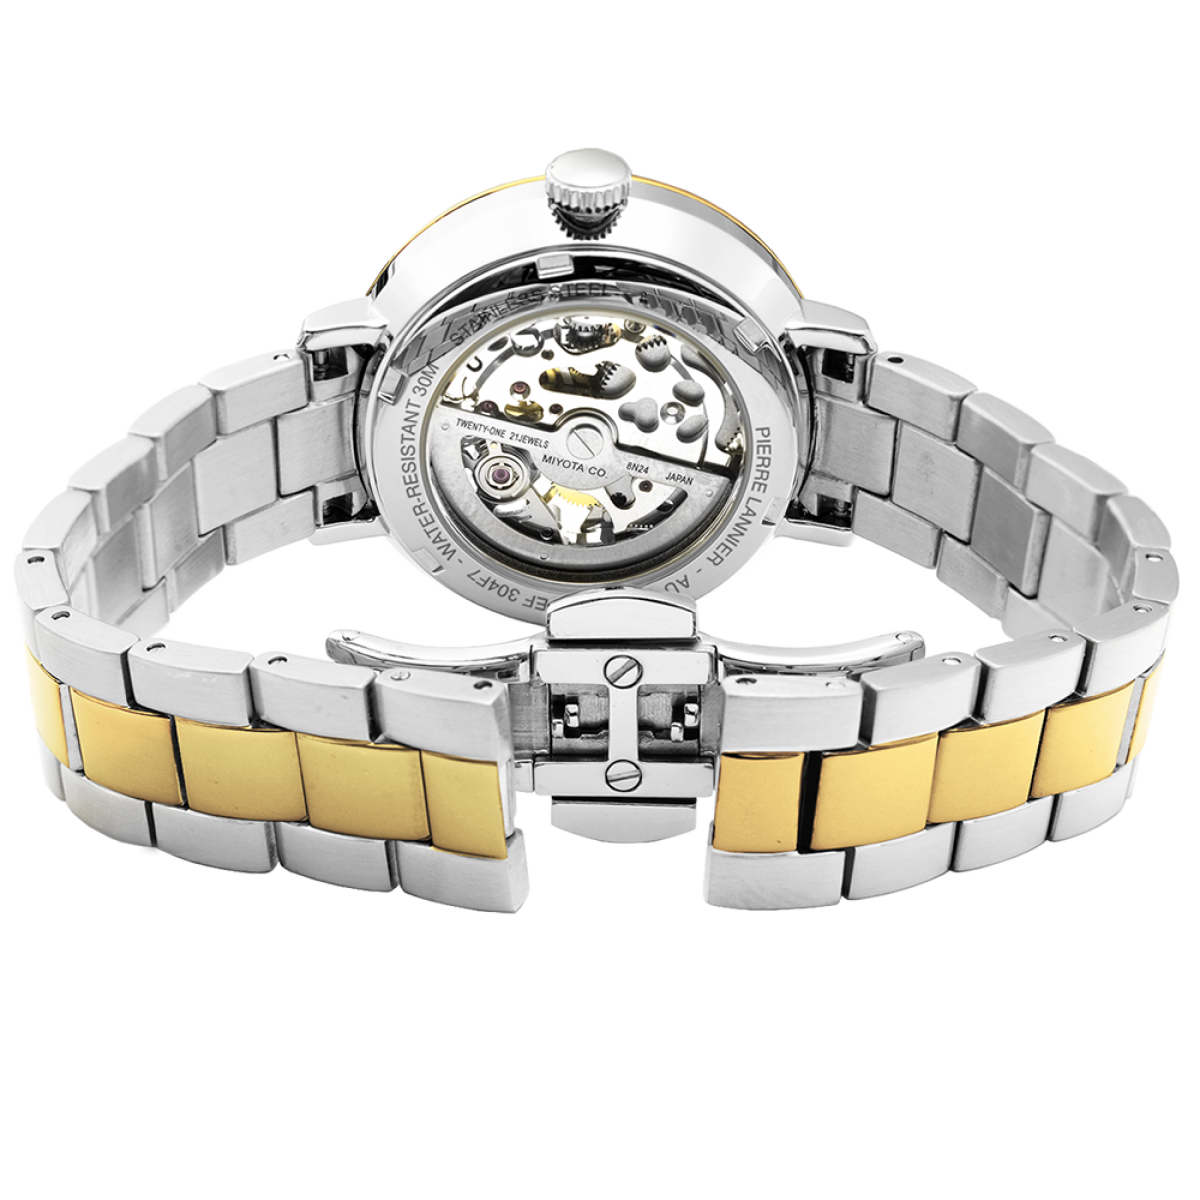 Женские часы Pierre Lannier AUTOMATIC 304f721